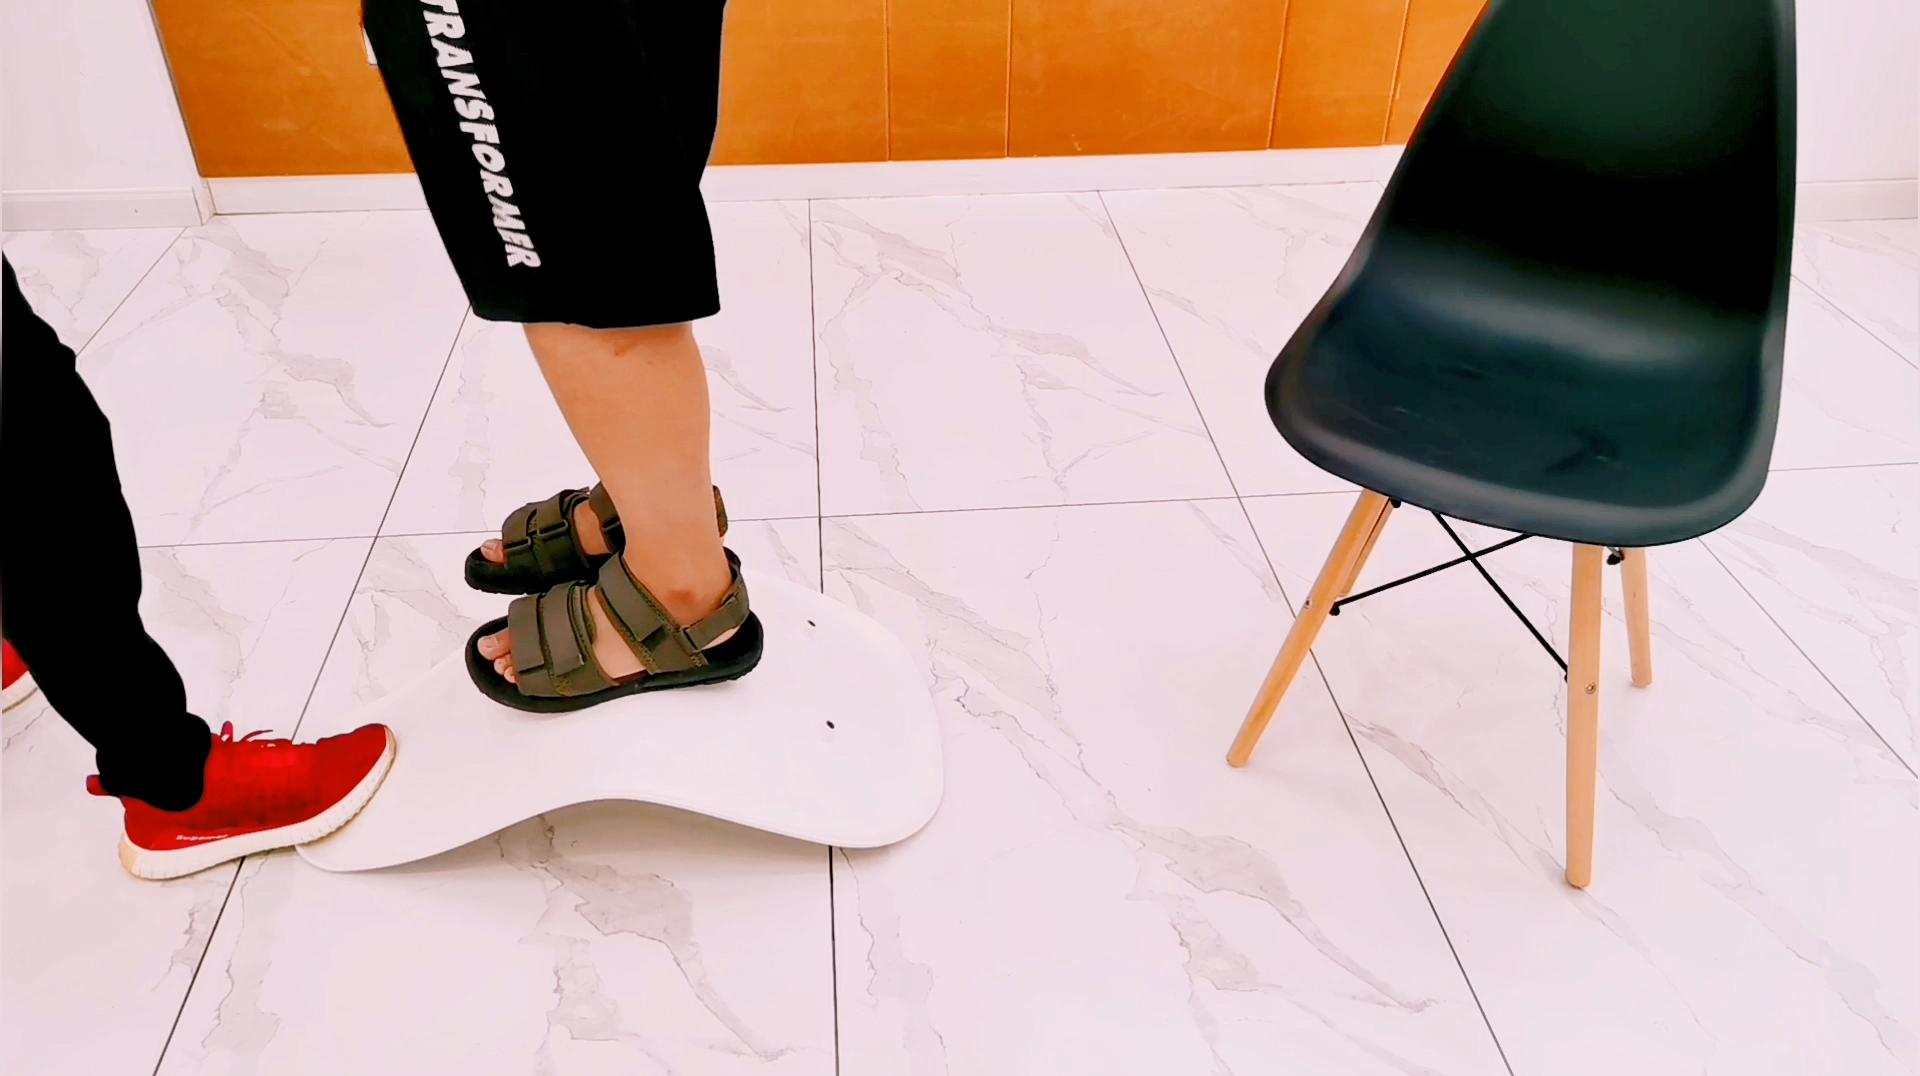 Harga Kursi Santai Plastik Stabil Terbaik untuk Kursi Santai